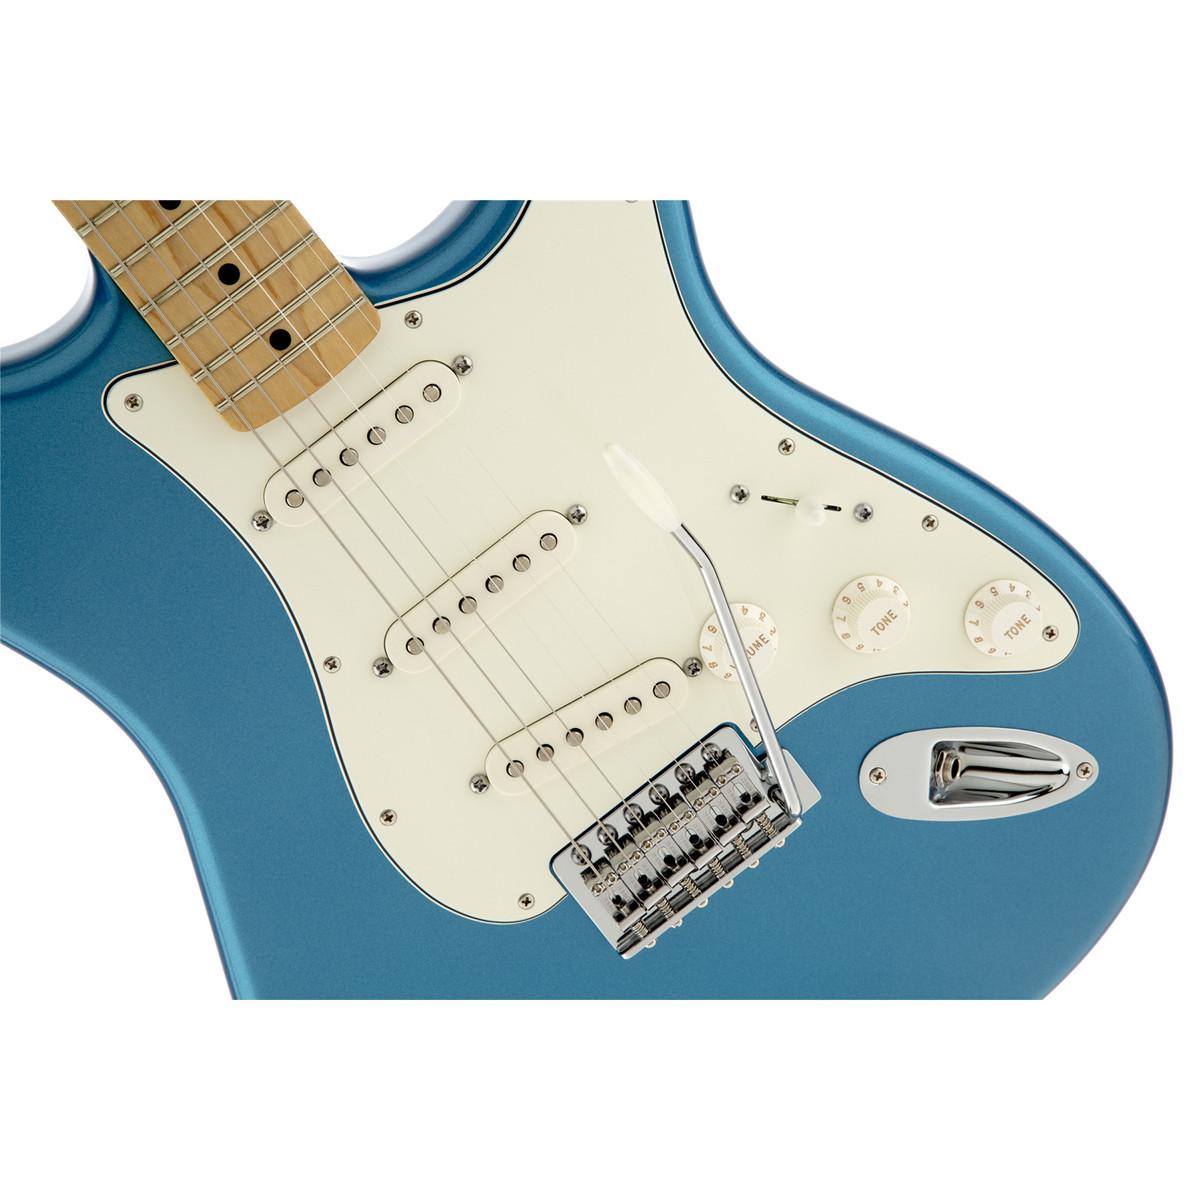 DISC Fender Standard Stratocaster MN, Lake Placid Blue at Gear4music